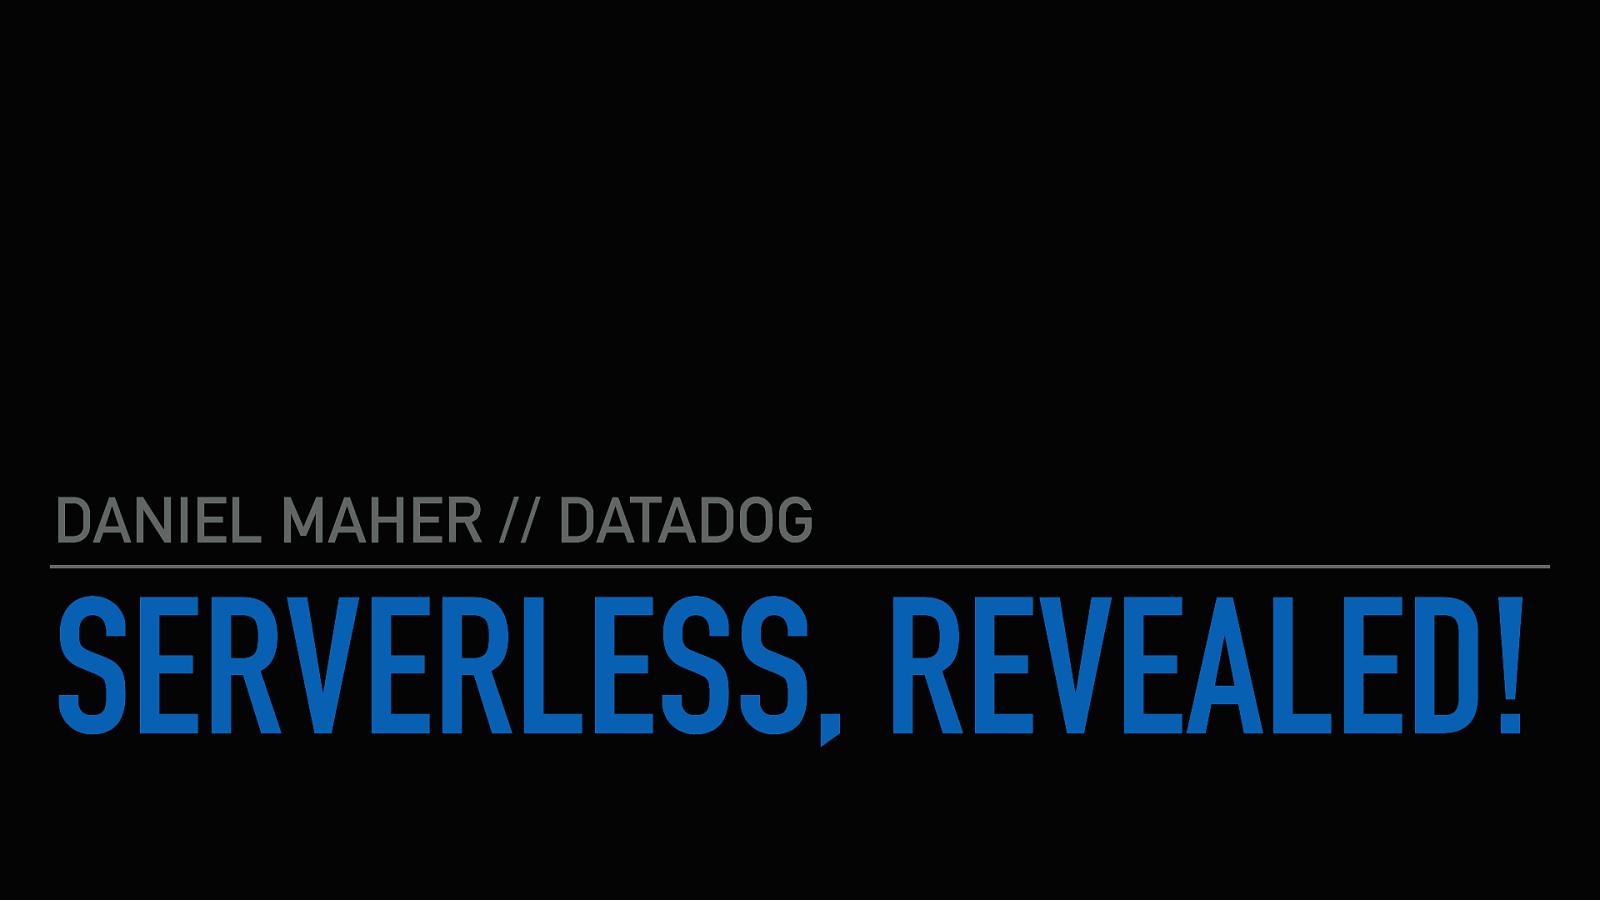 Serverless, Revealed!